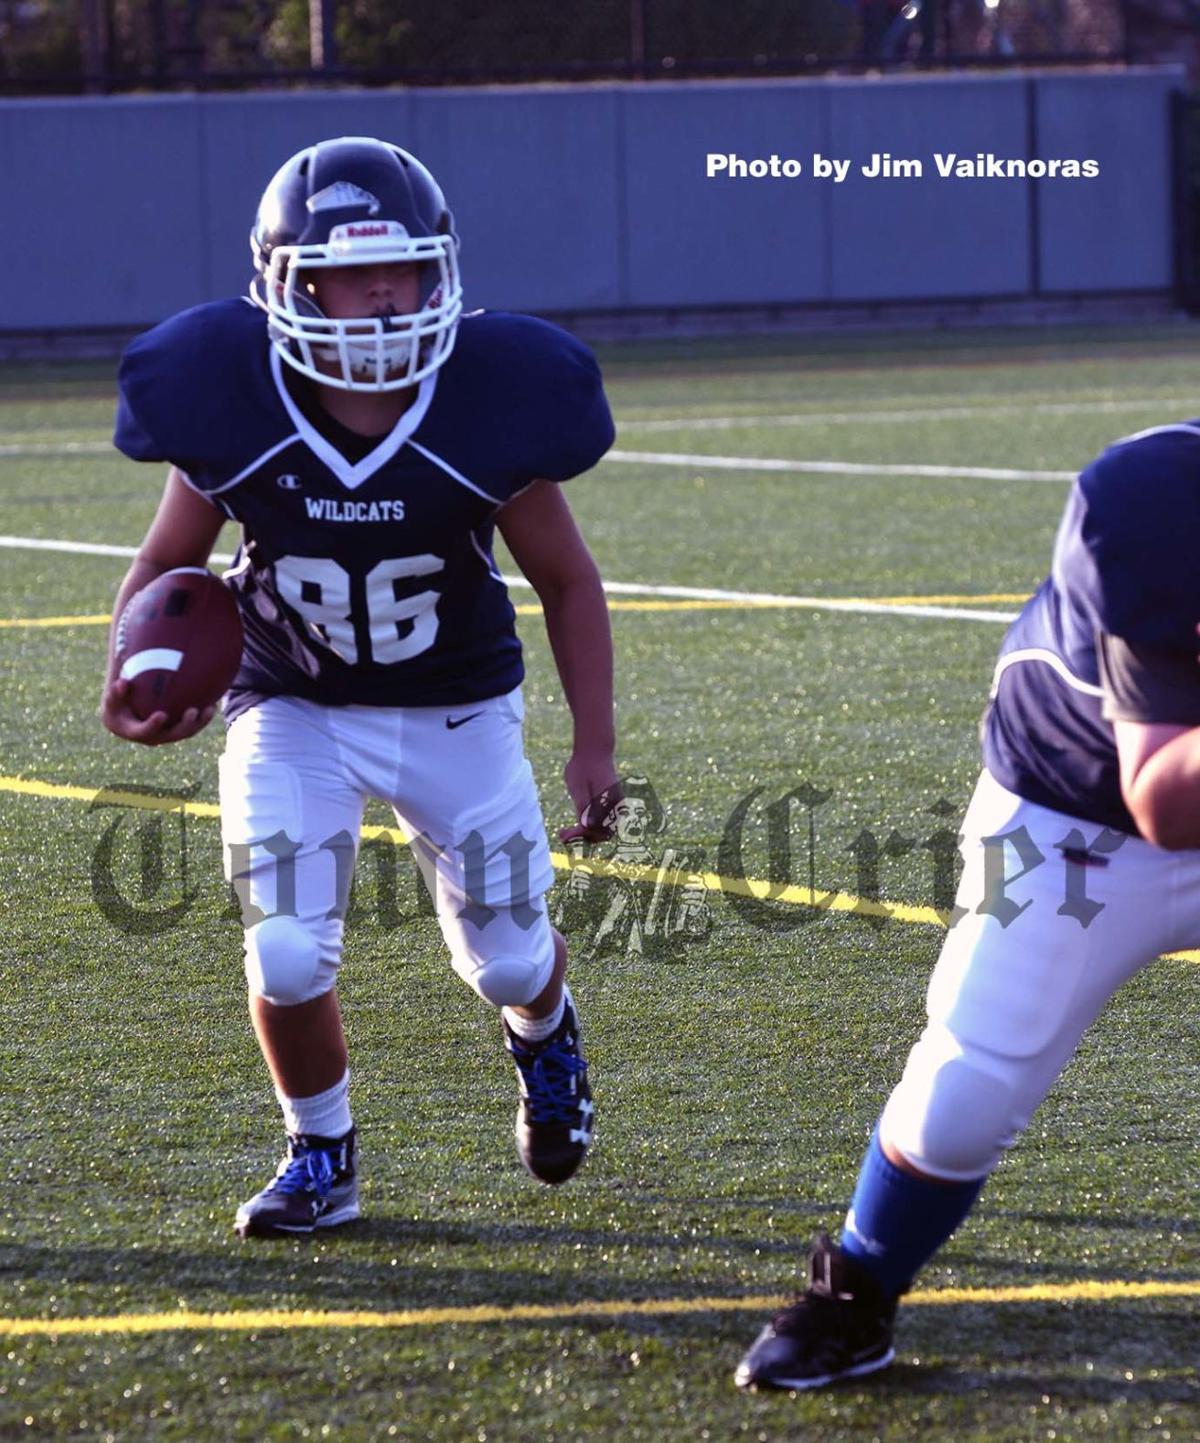 Middle School Football player Ryan Murphy